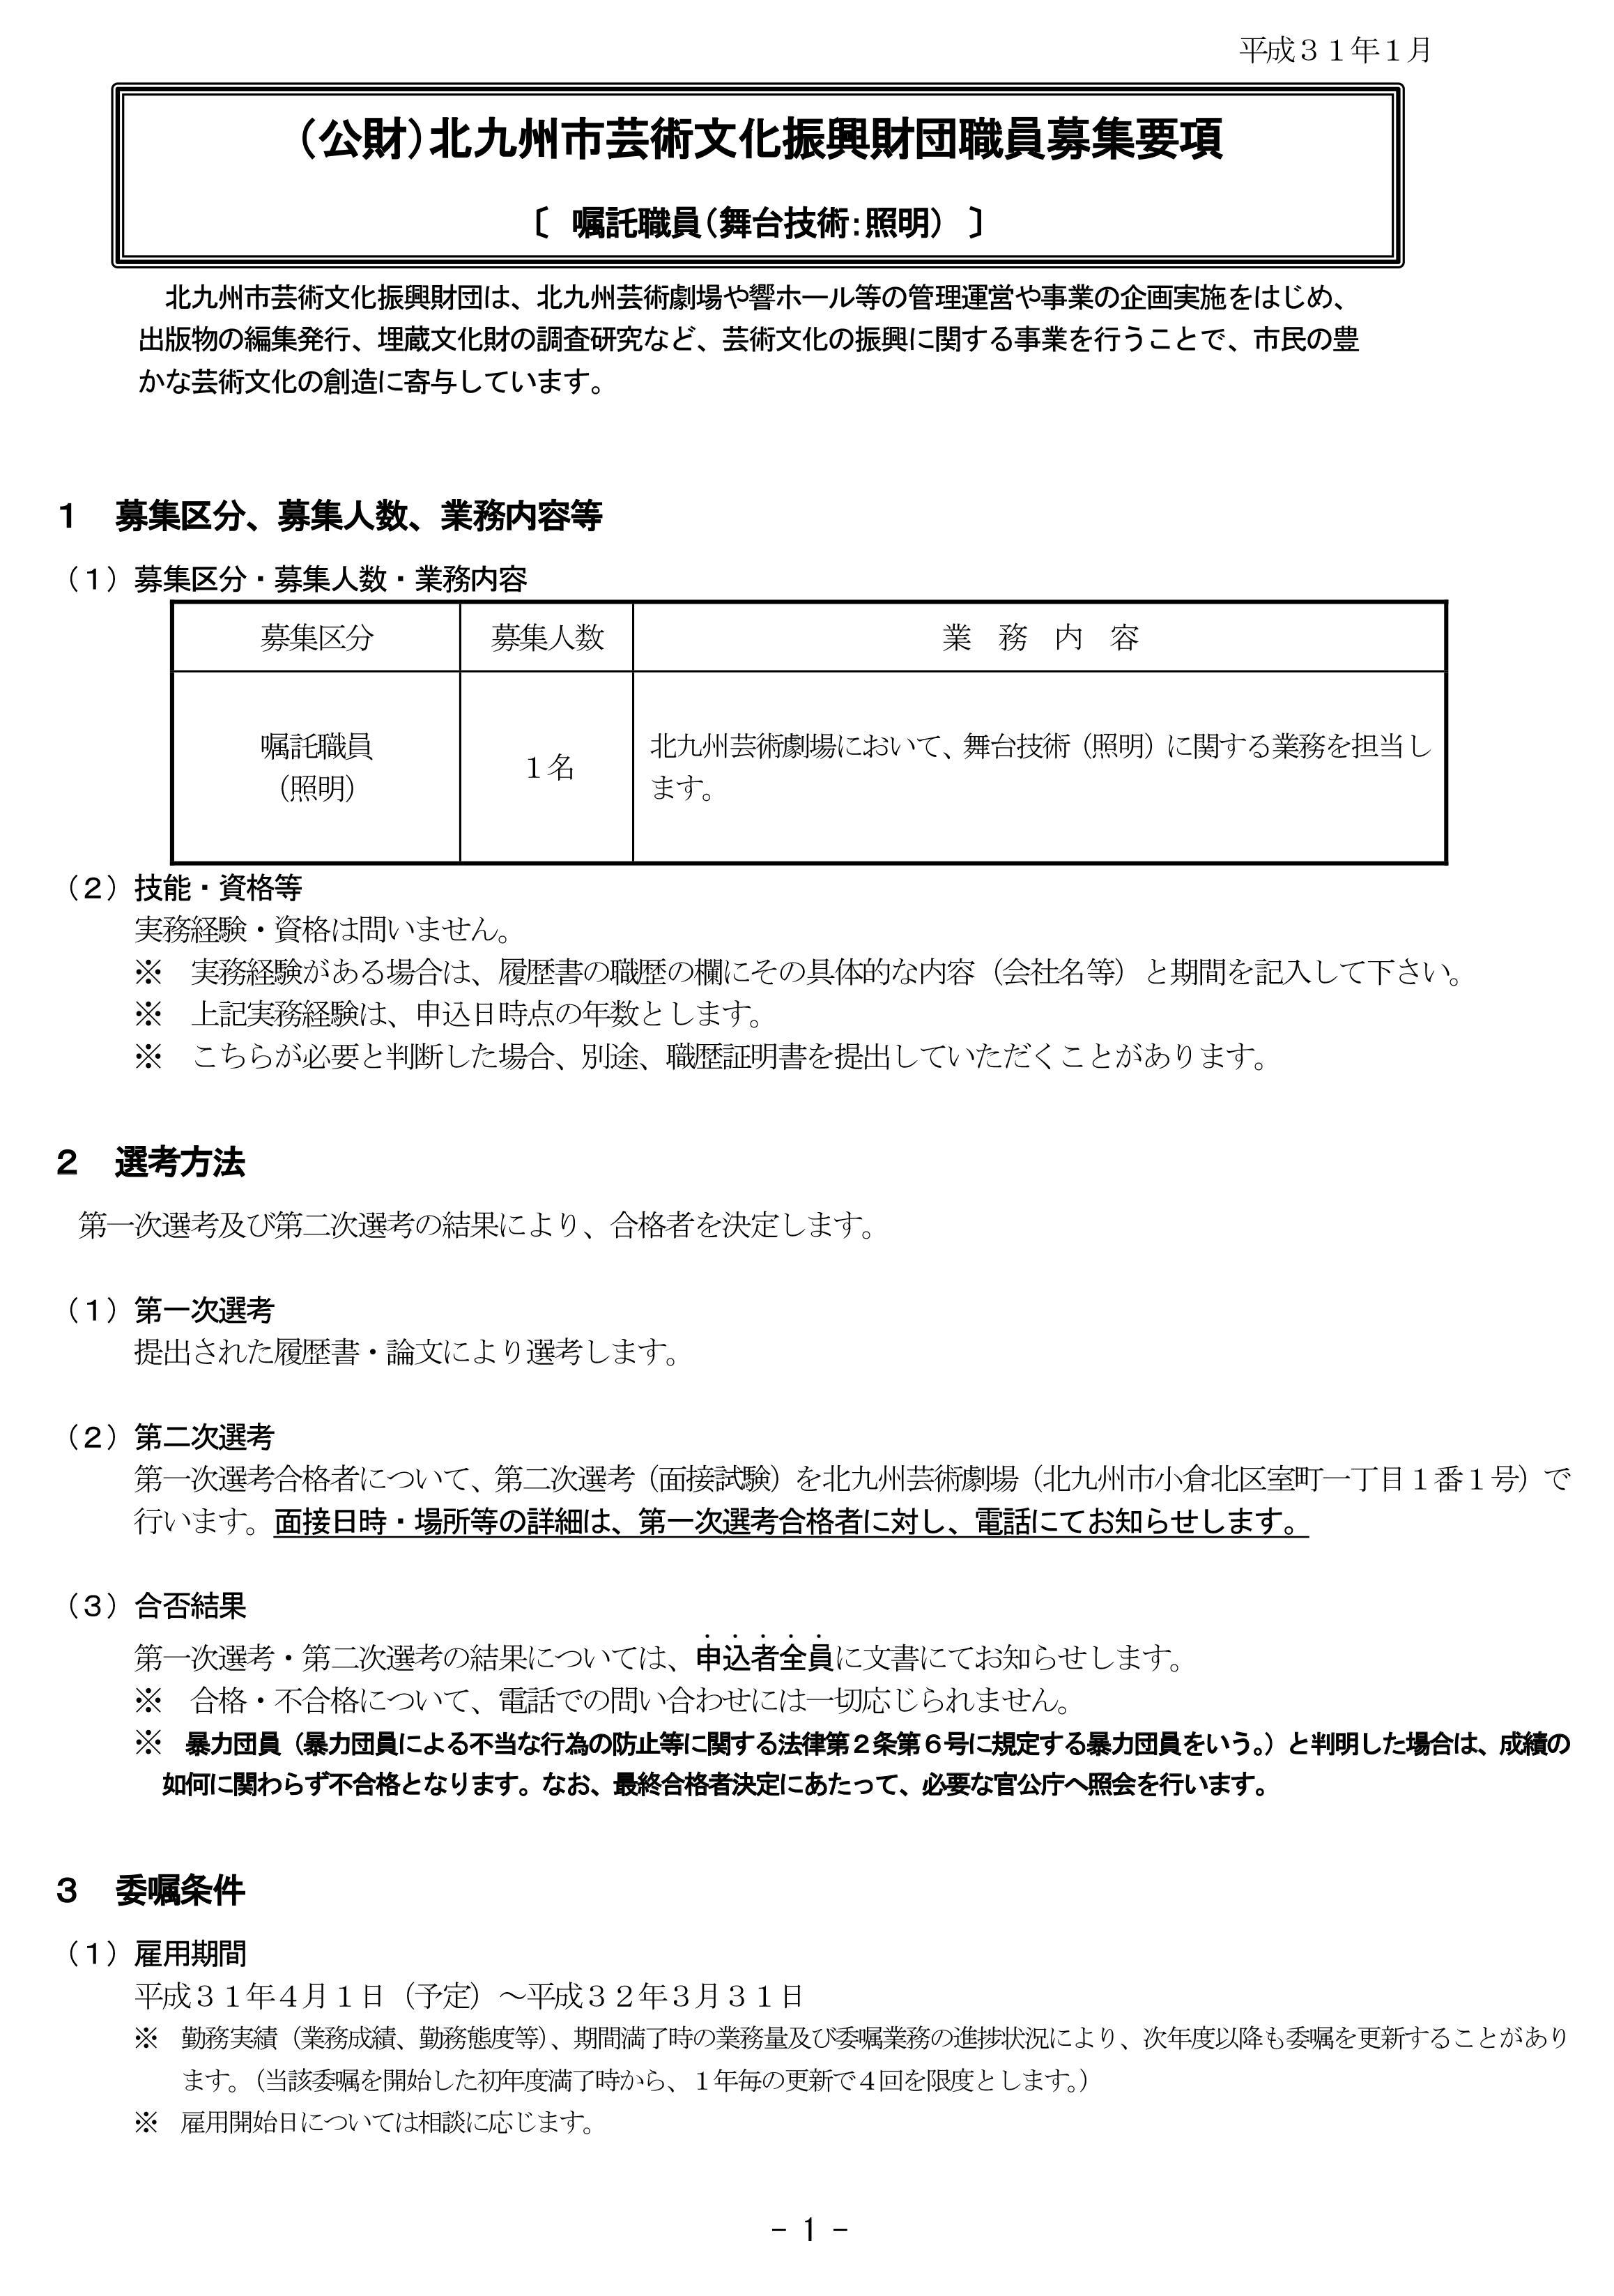 H31_syomei_youkou-1.jpg